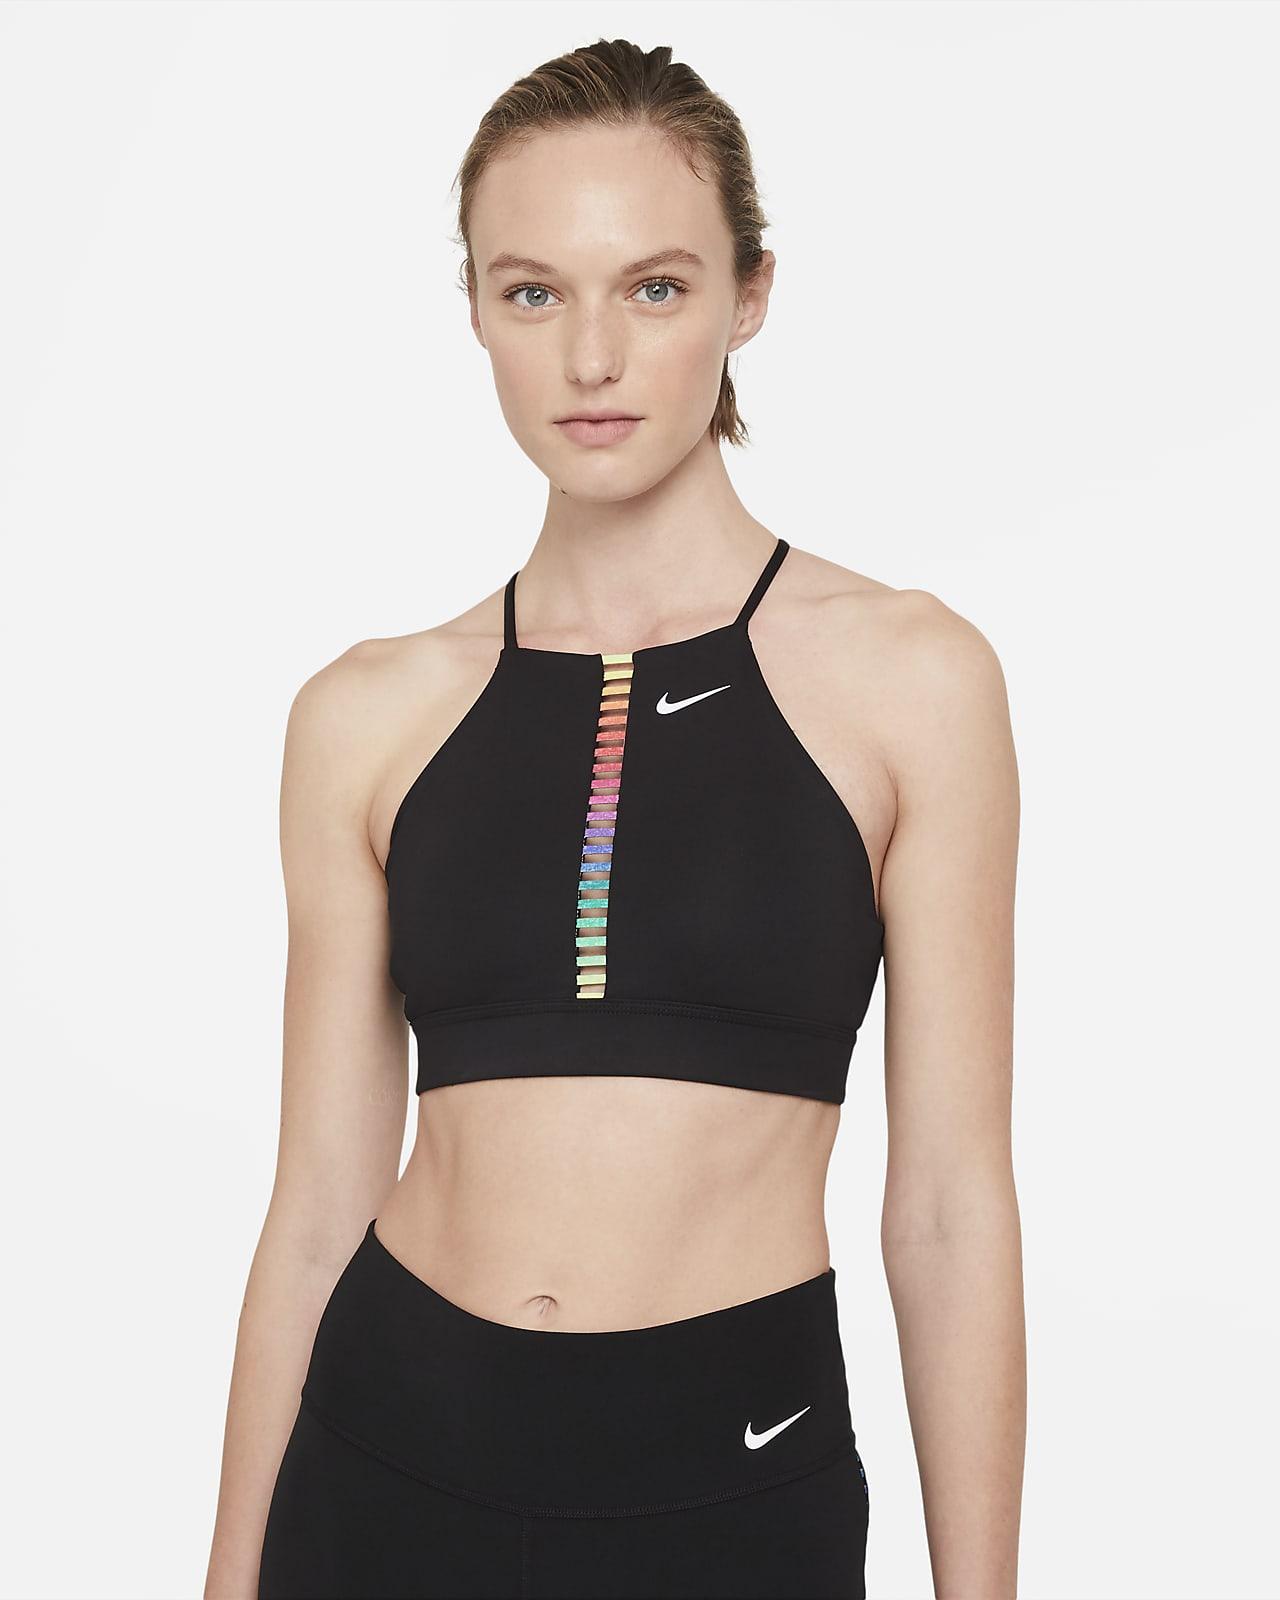 Nike Dri-FIT Indy Rainbow Ladder Women's Light-Support Padded High-Neck Sports Bra